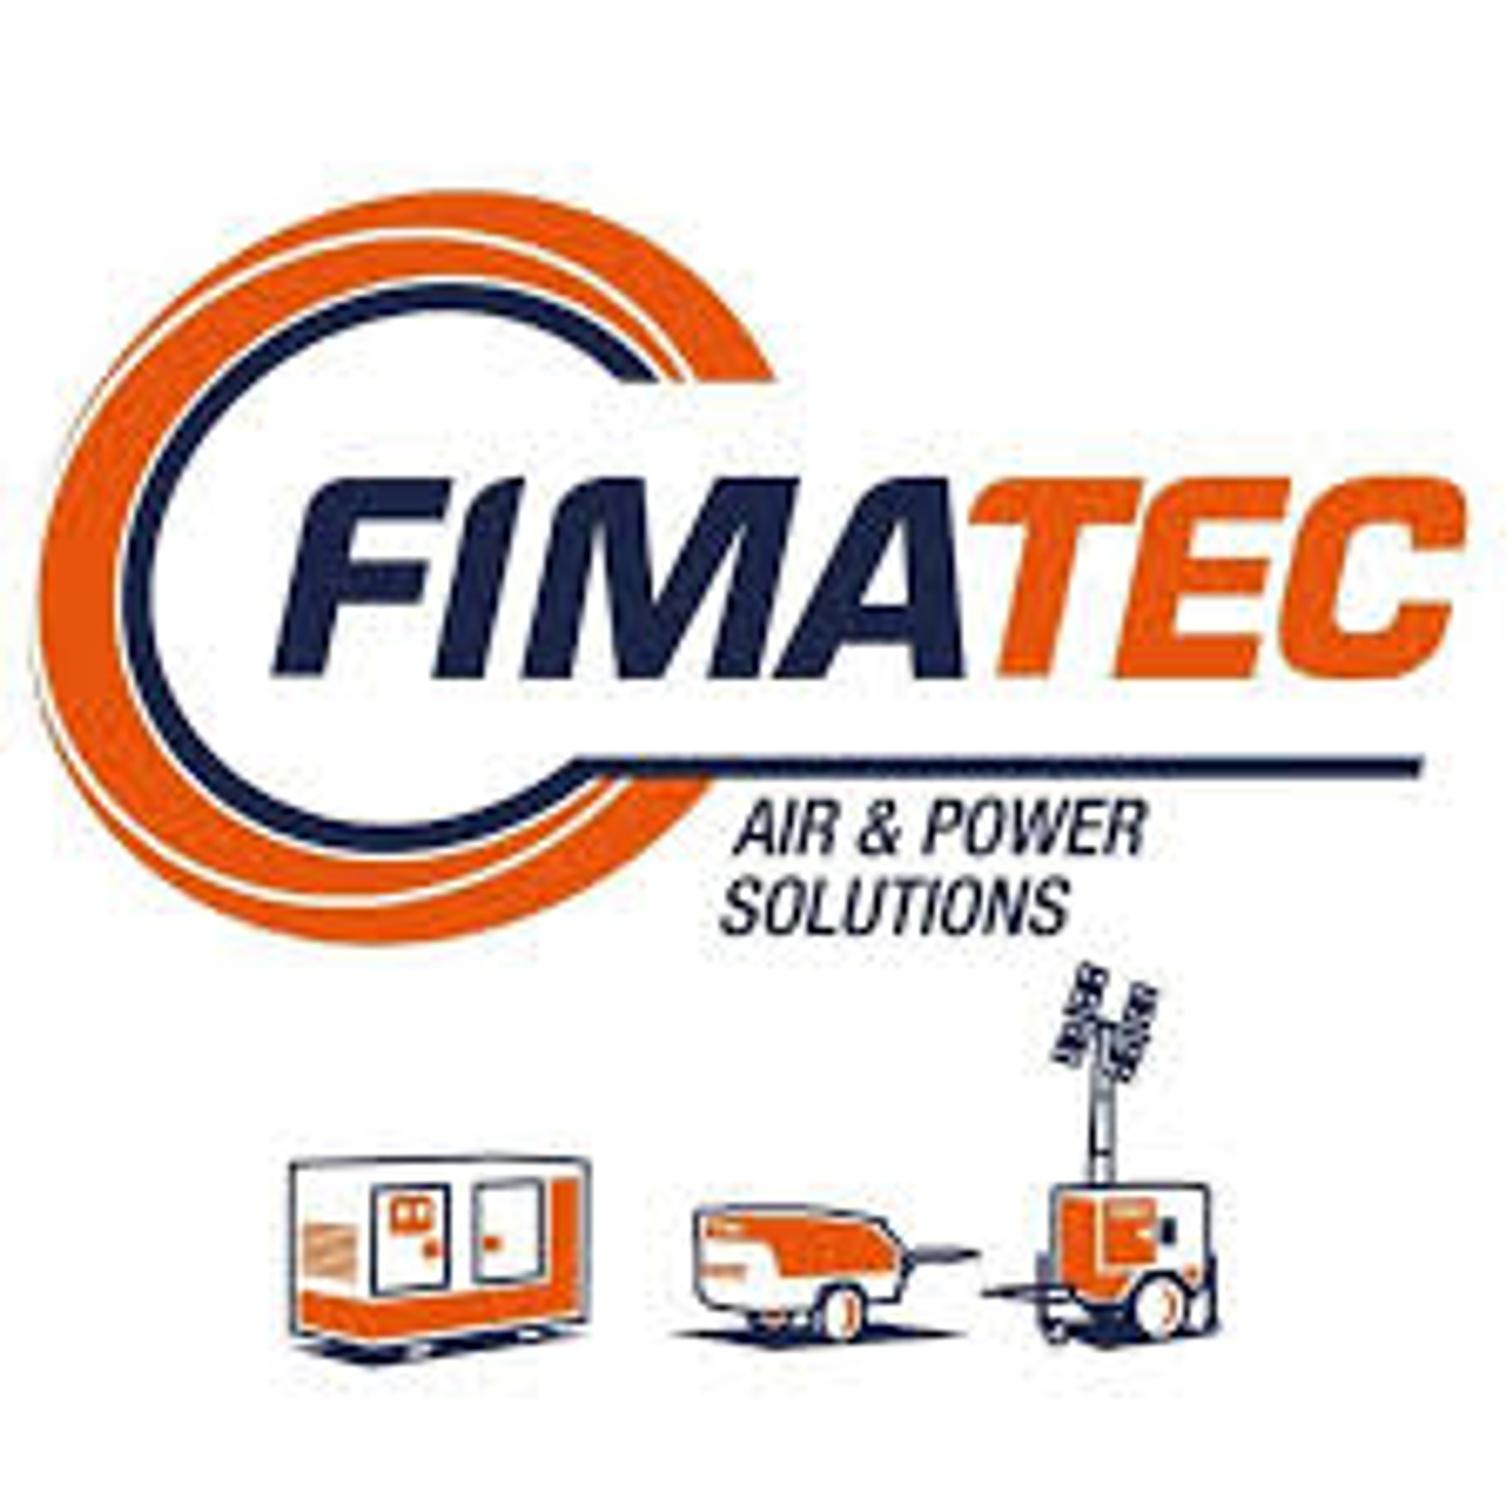 logo Fimatec - Air & Power solutions